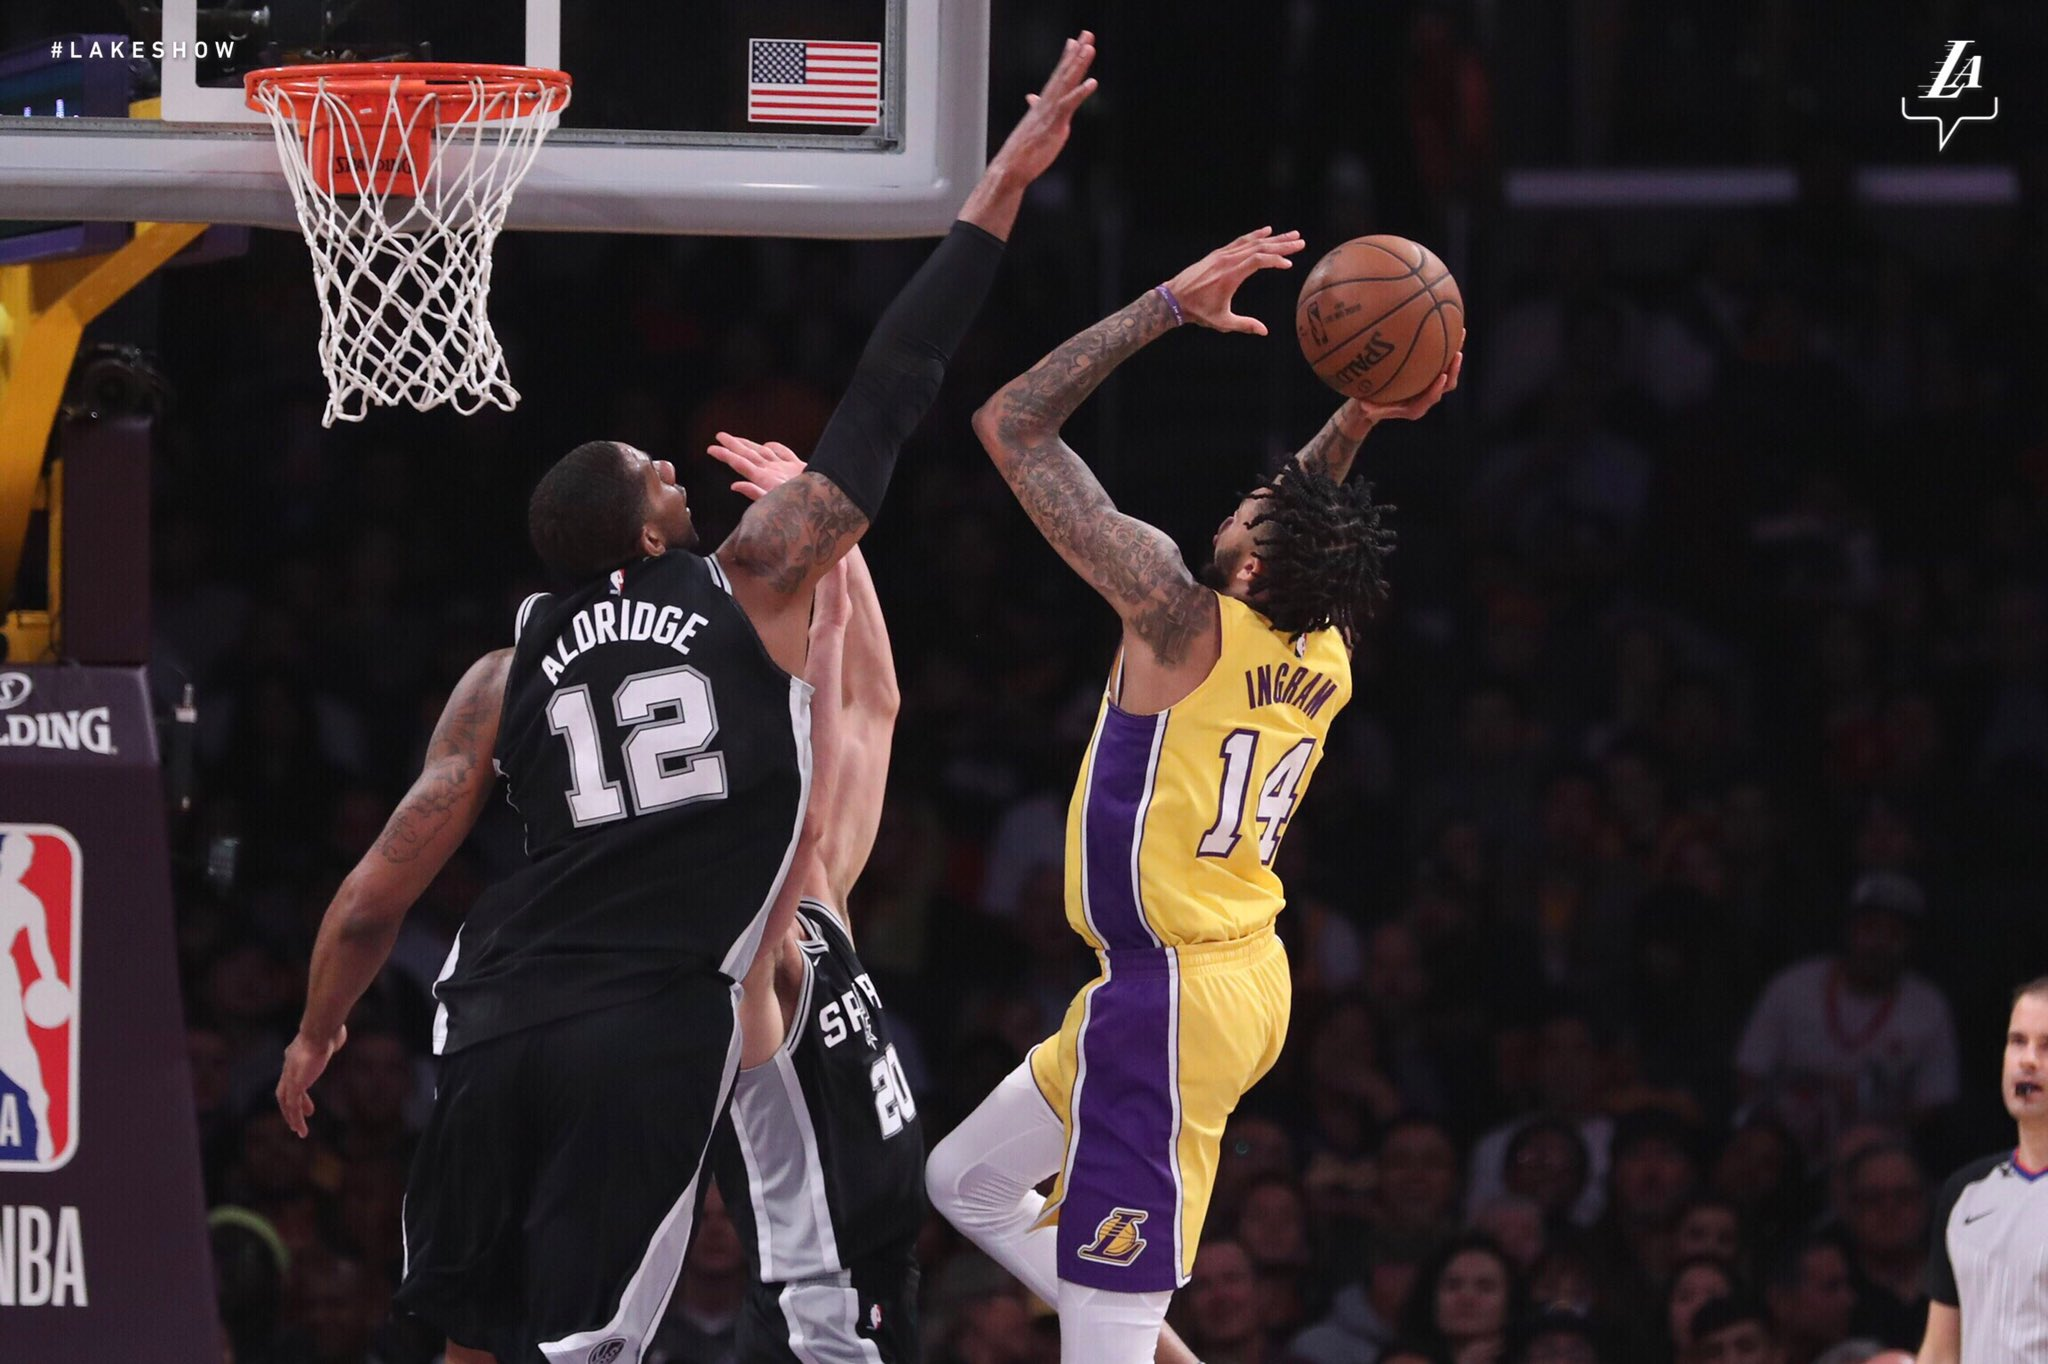 And-1️⃣! @B_Ingram13 #NBAVote https://t.co/osRqnyuOt8